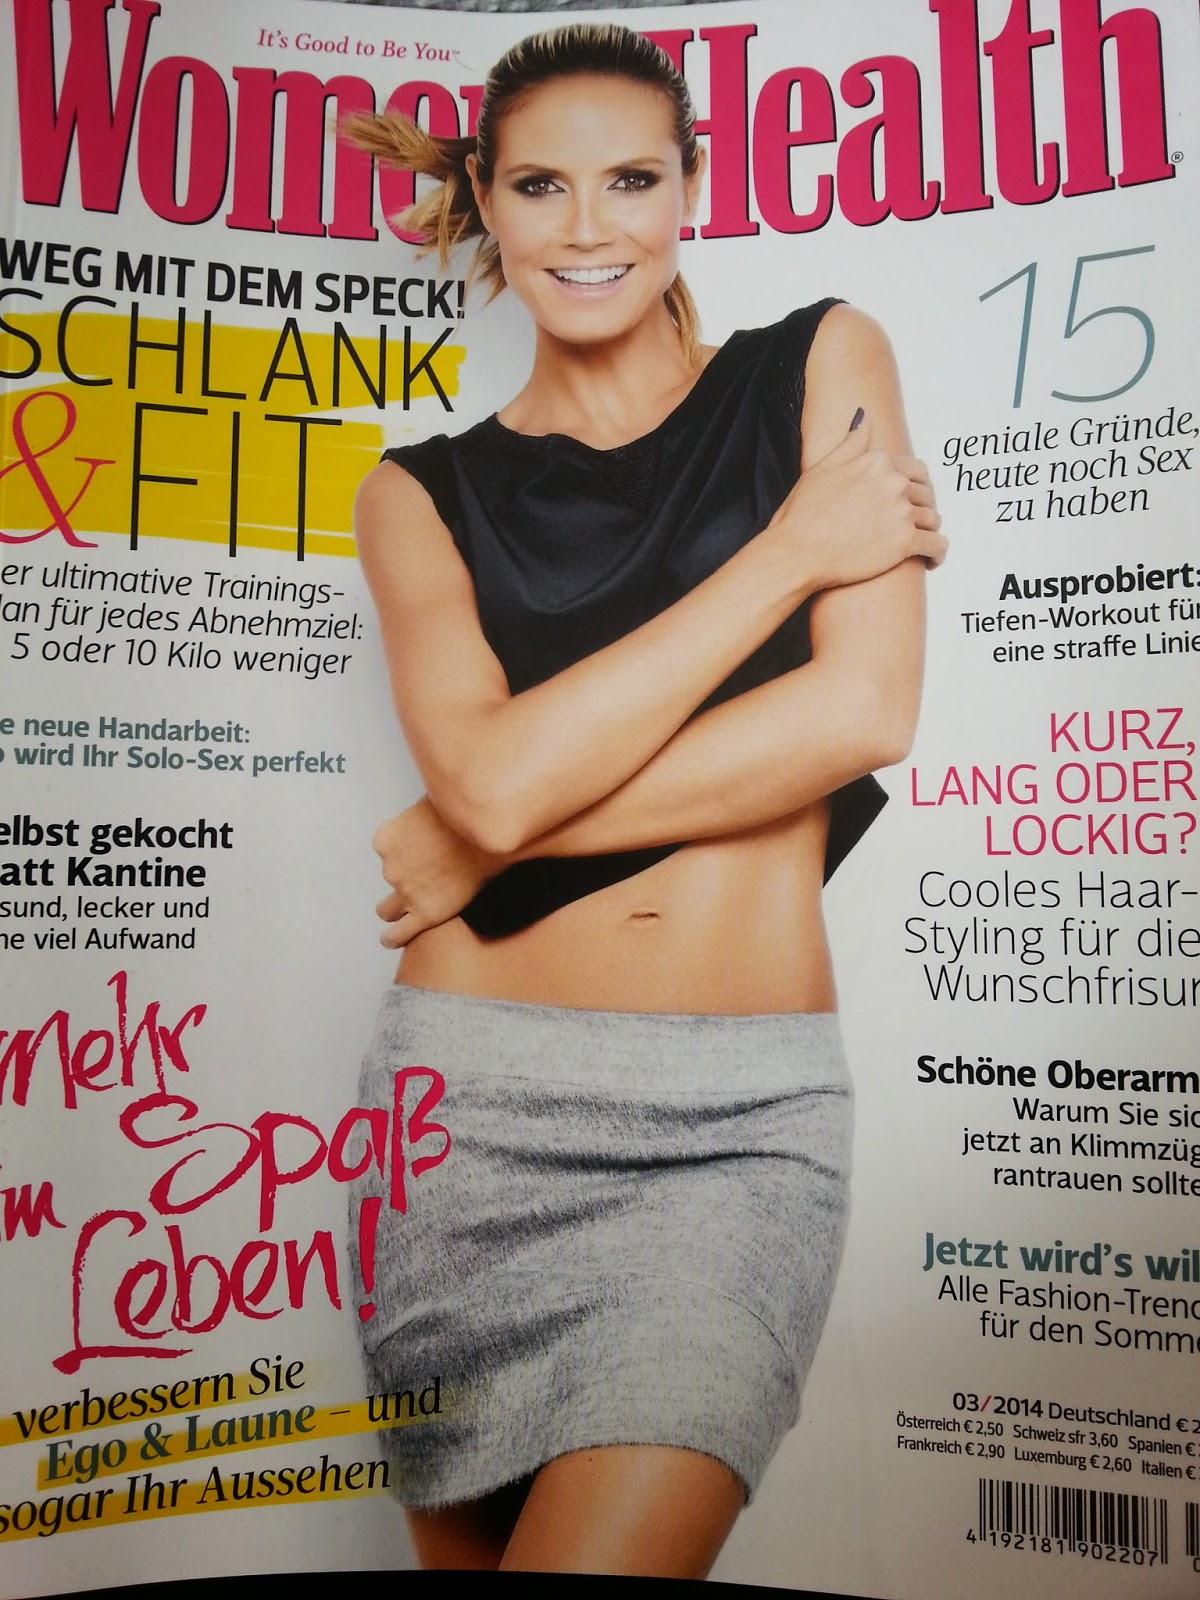 Women's Health Magazin - www.annitschkasblog.de